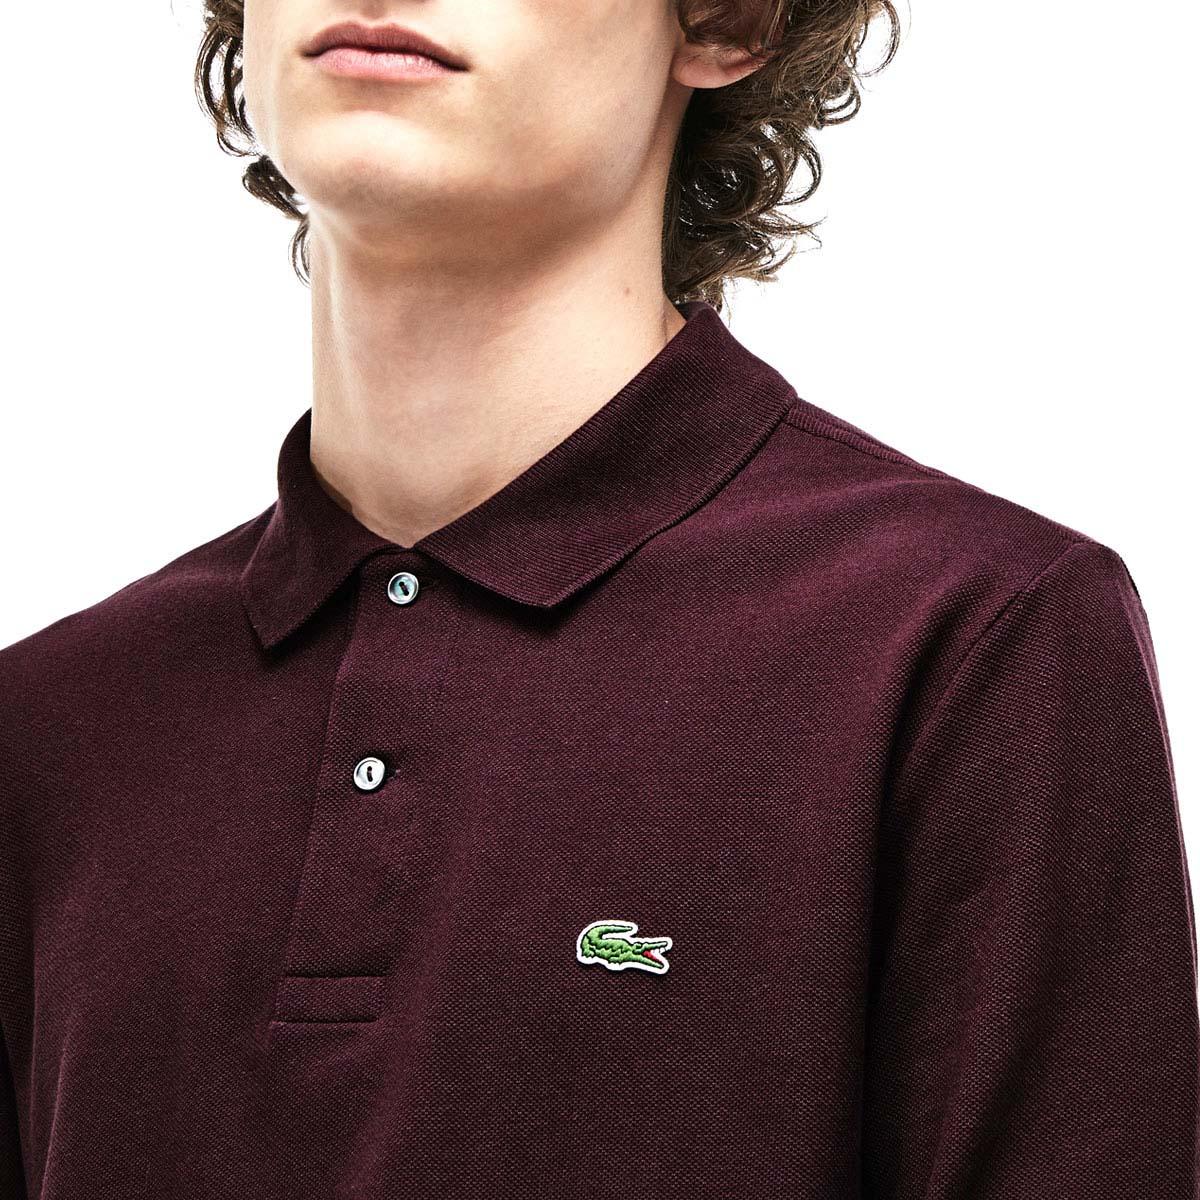 5711a745ff Lacoste Mens 2019 Classic Cotton Long Sleeve L1312 Polo Shirt | eBay